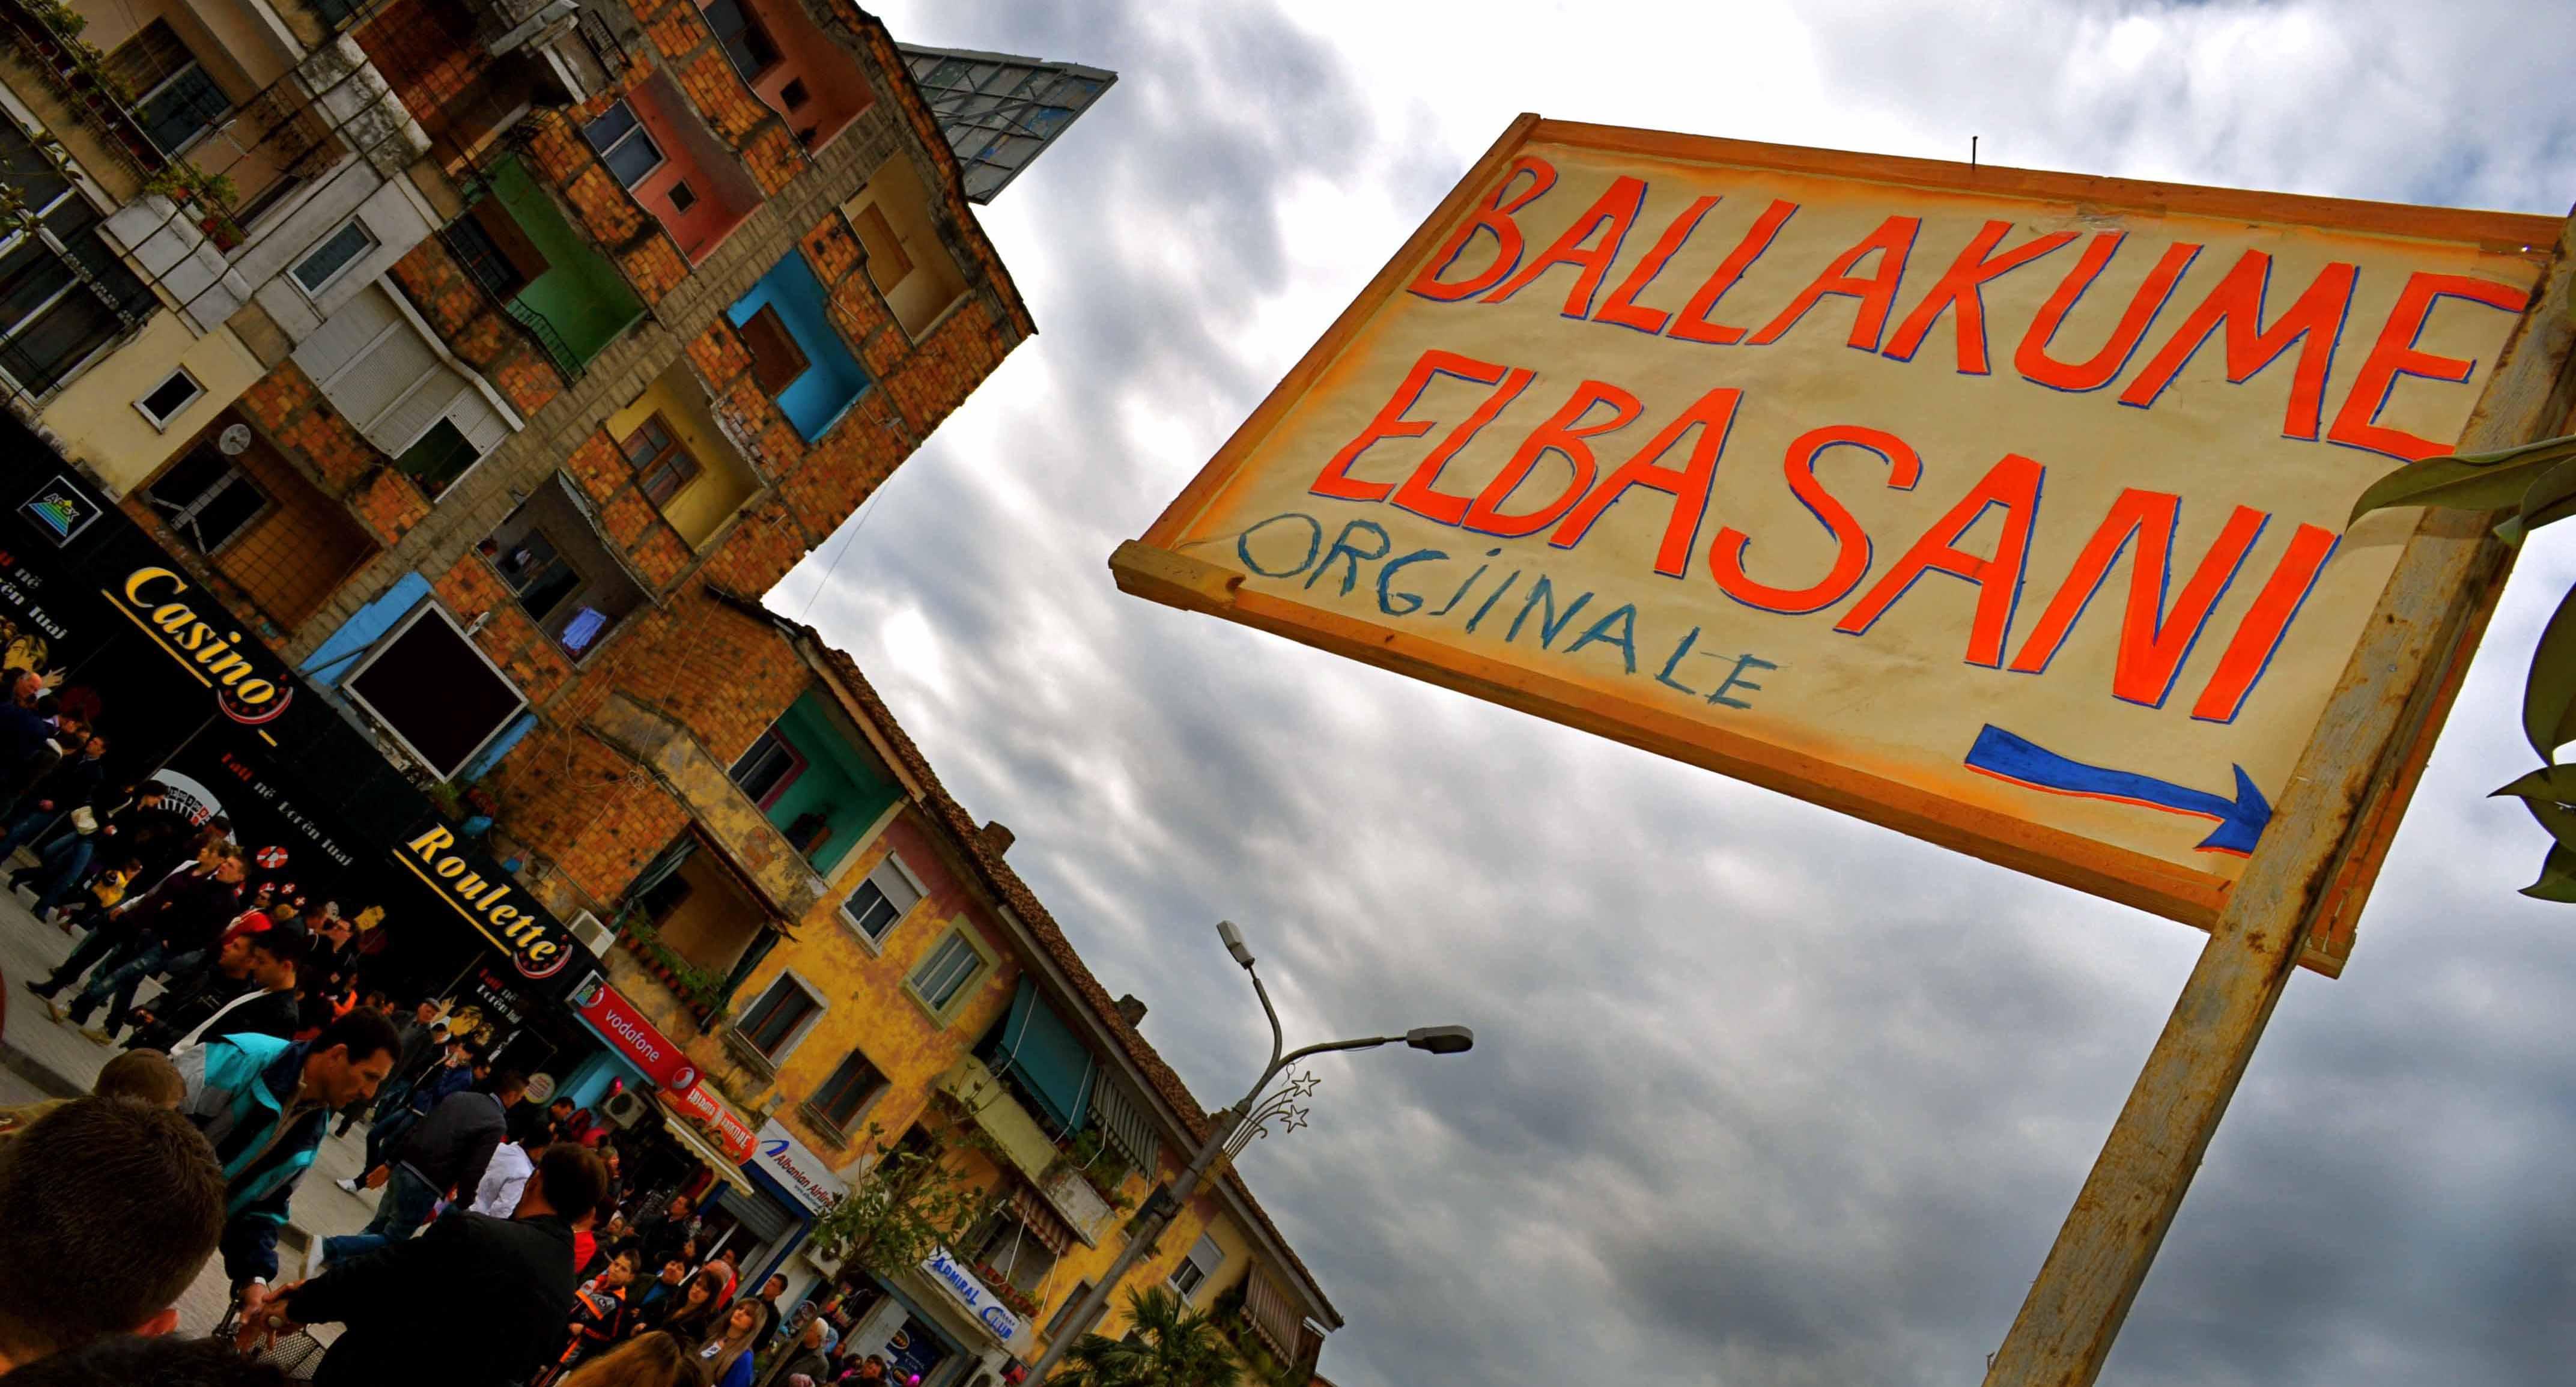 Si lindi 'Dita e Verës, festa tradicionale e Elbasanit